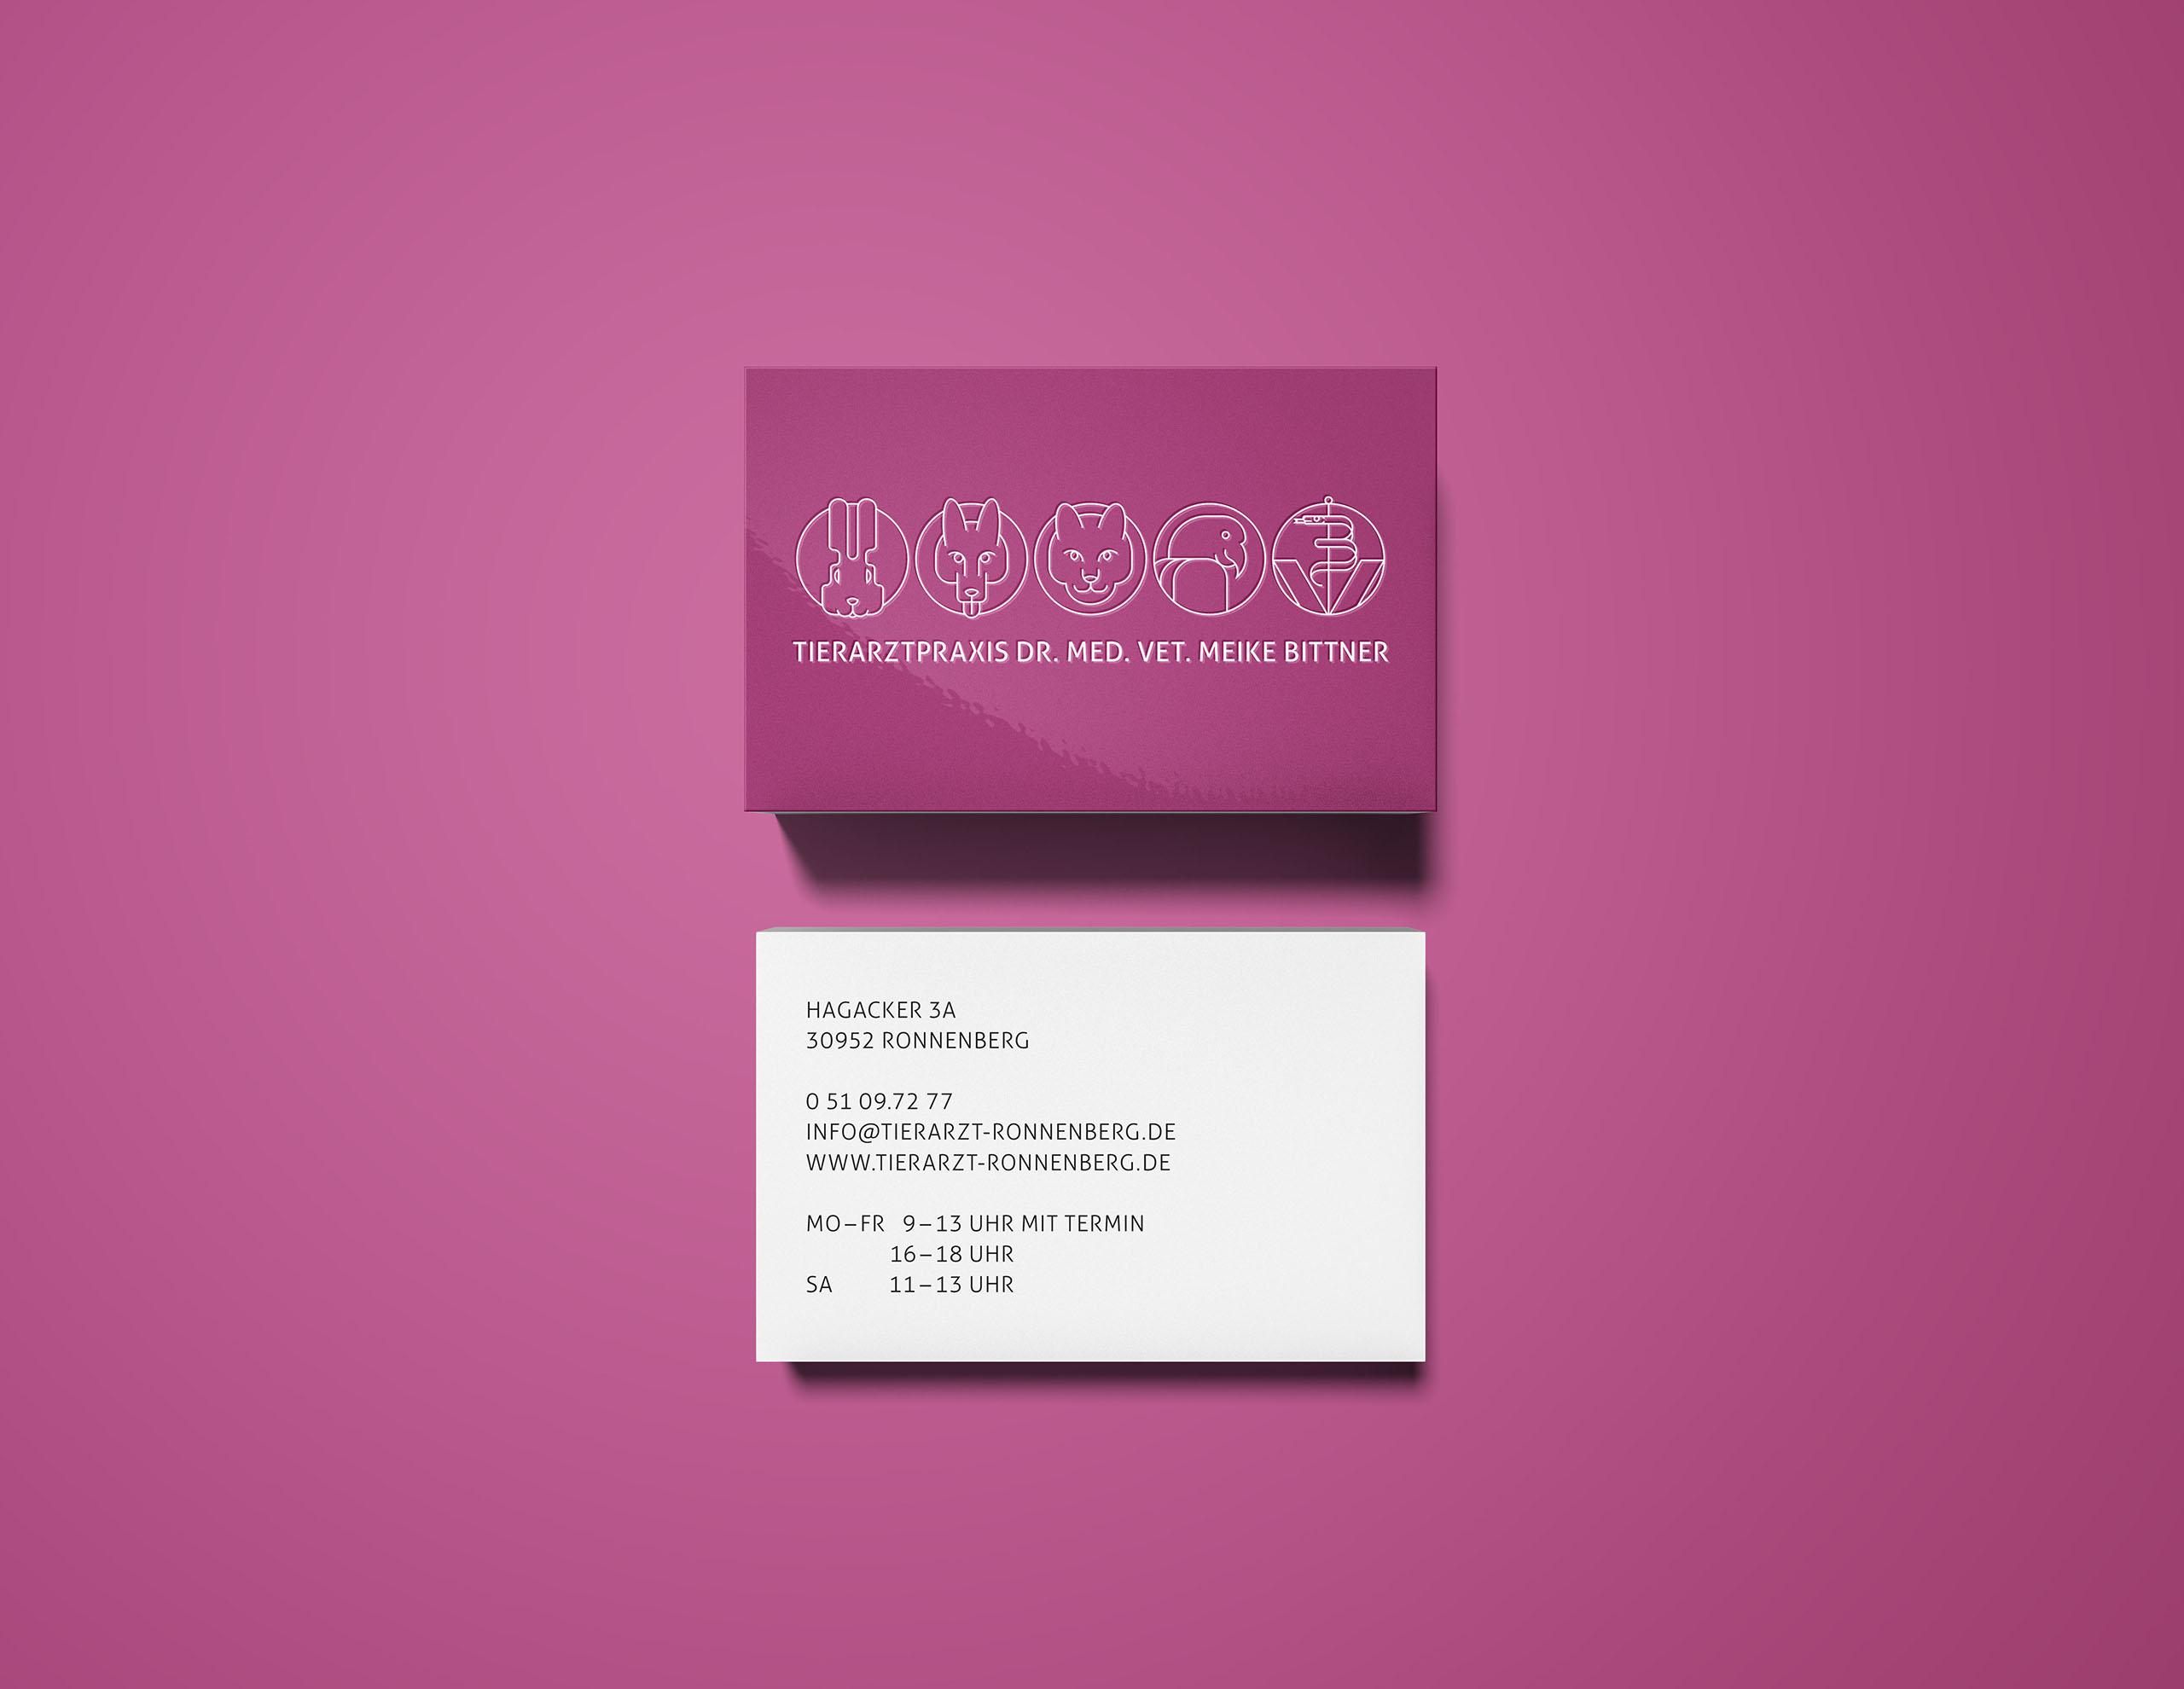 191213_Bittner_Overhead Business Card Mockup europa_2560x1920